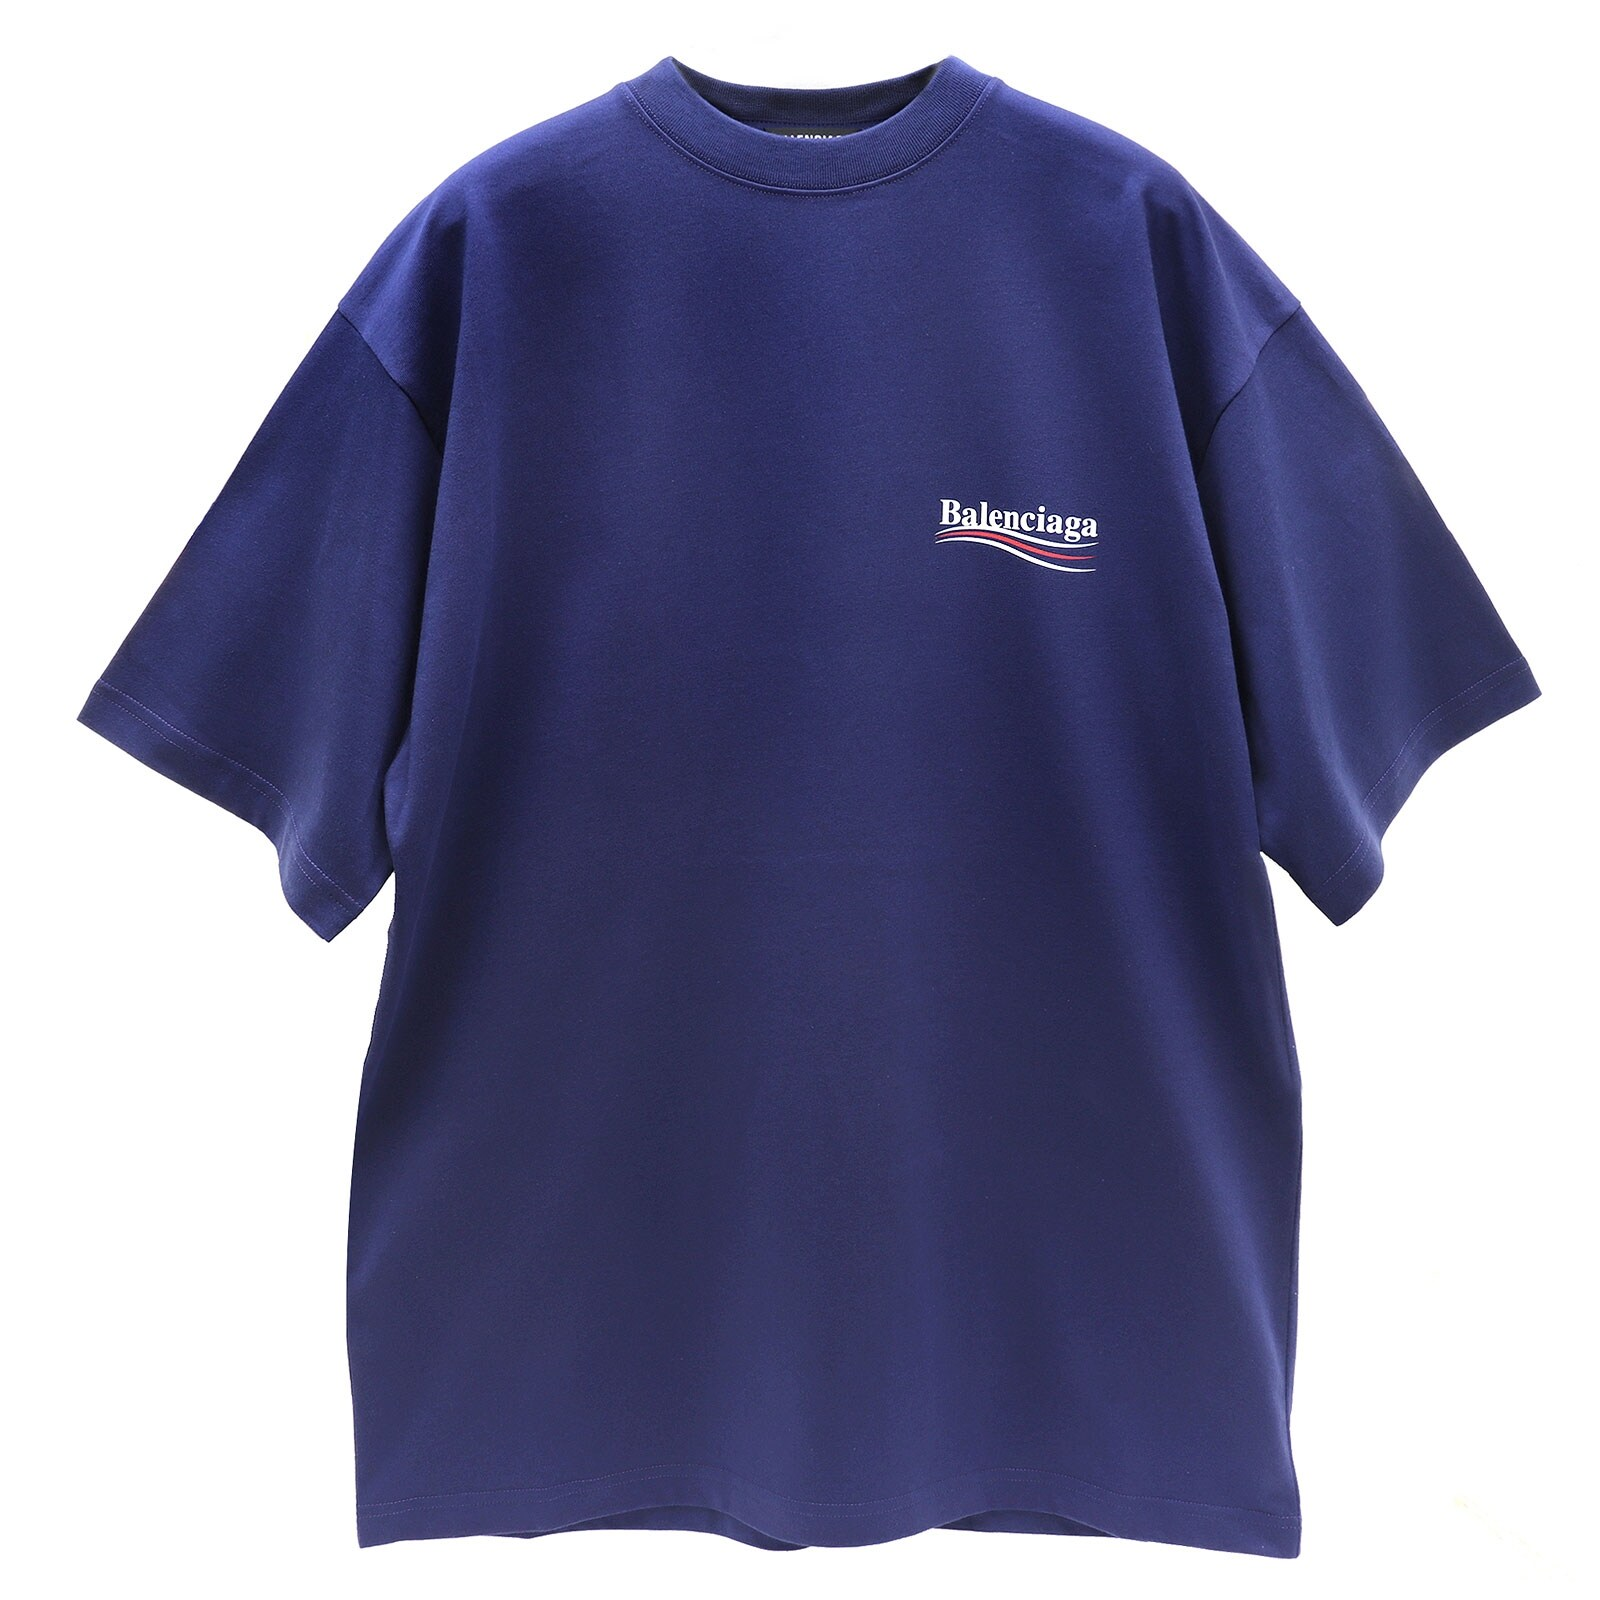 BALENCIAGA 발렌시아가 웨이브 로고 라지 핏 티셔츠 641675 TIV52 1195-16-4689563028